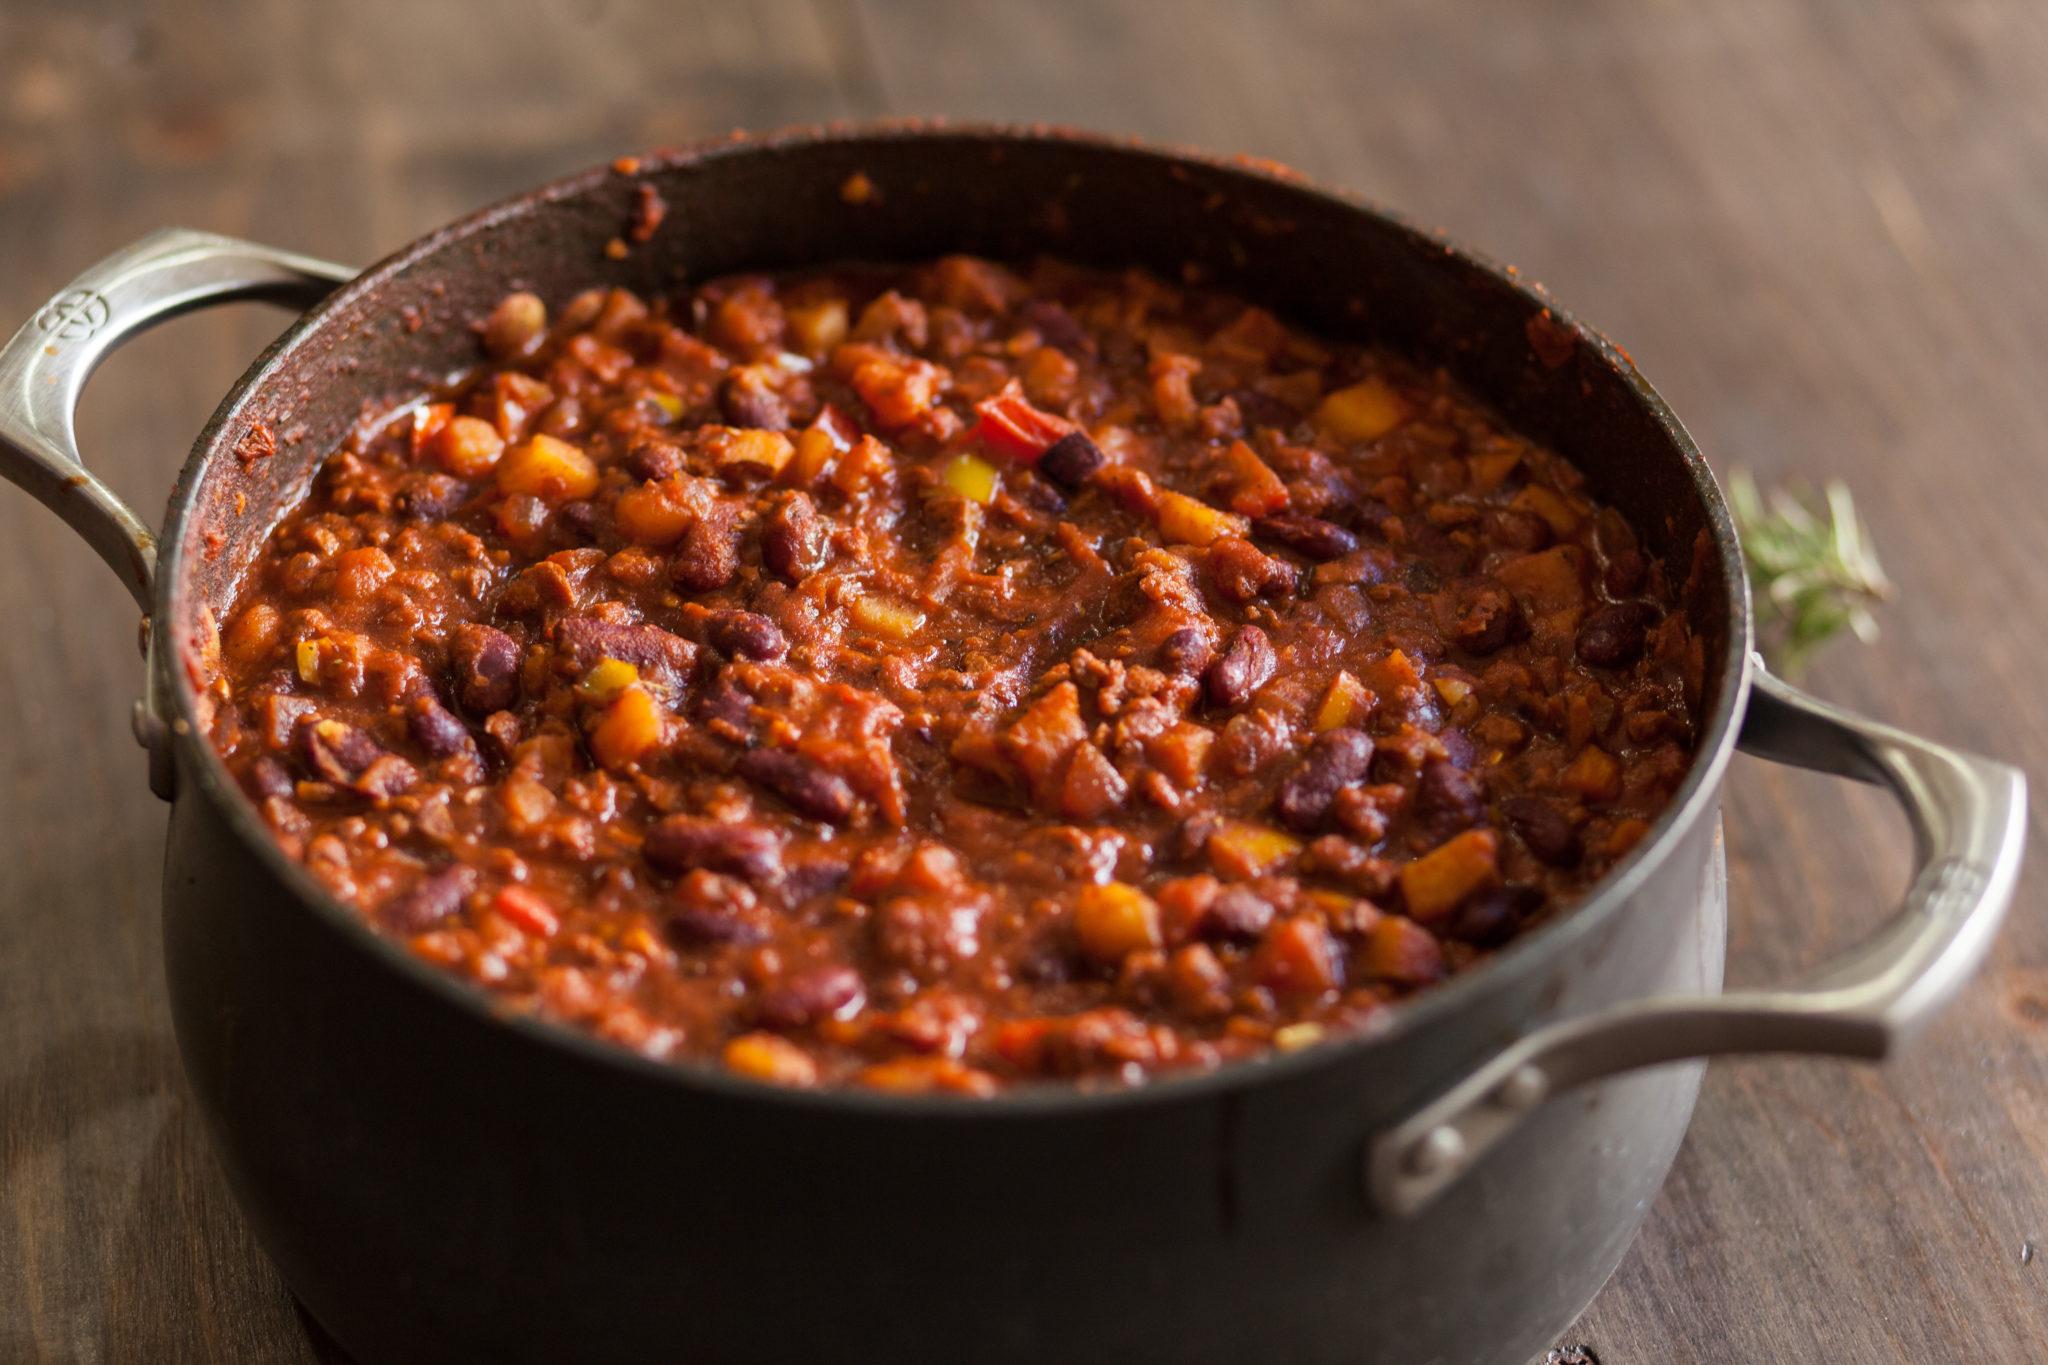 Grizzly con Carne – Das Chili mit dem extra Kick